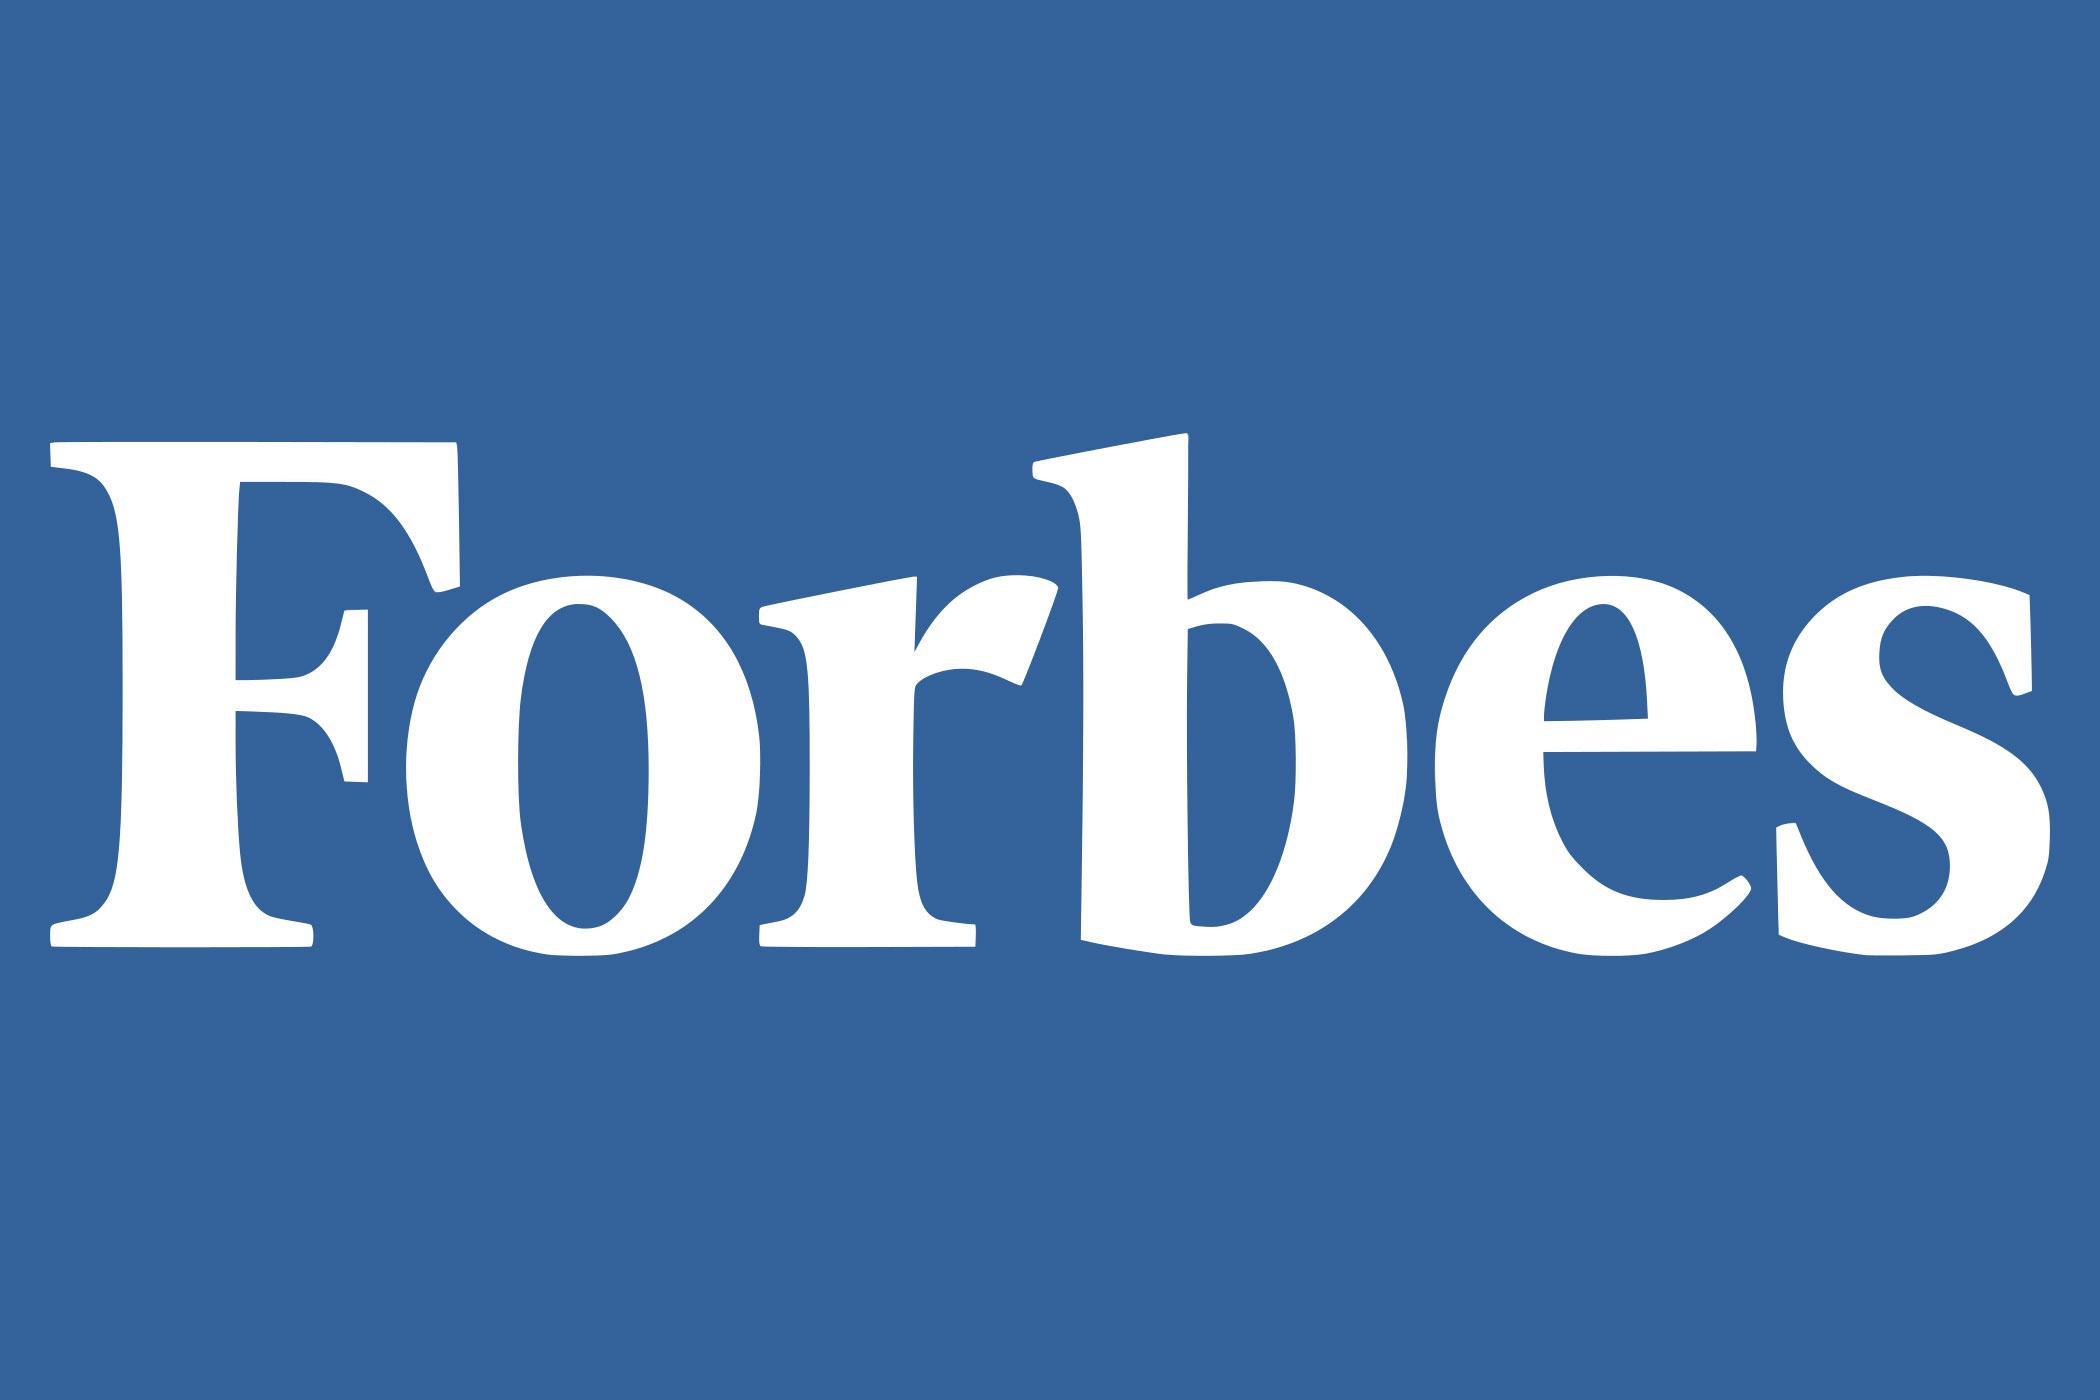 100 Greatest Living Business Minds: On Experimentation - Craig Venter - Sep. 20, 2017